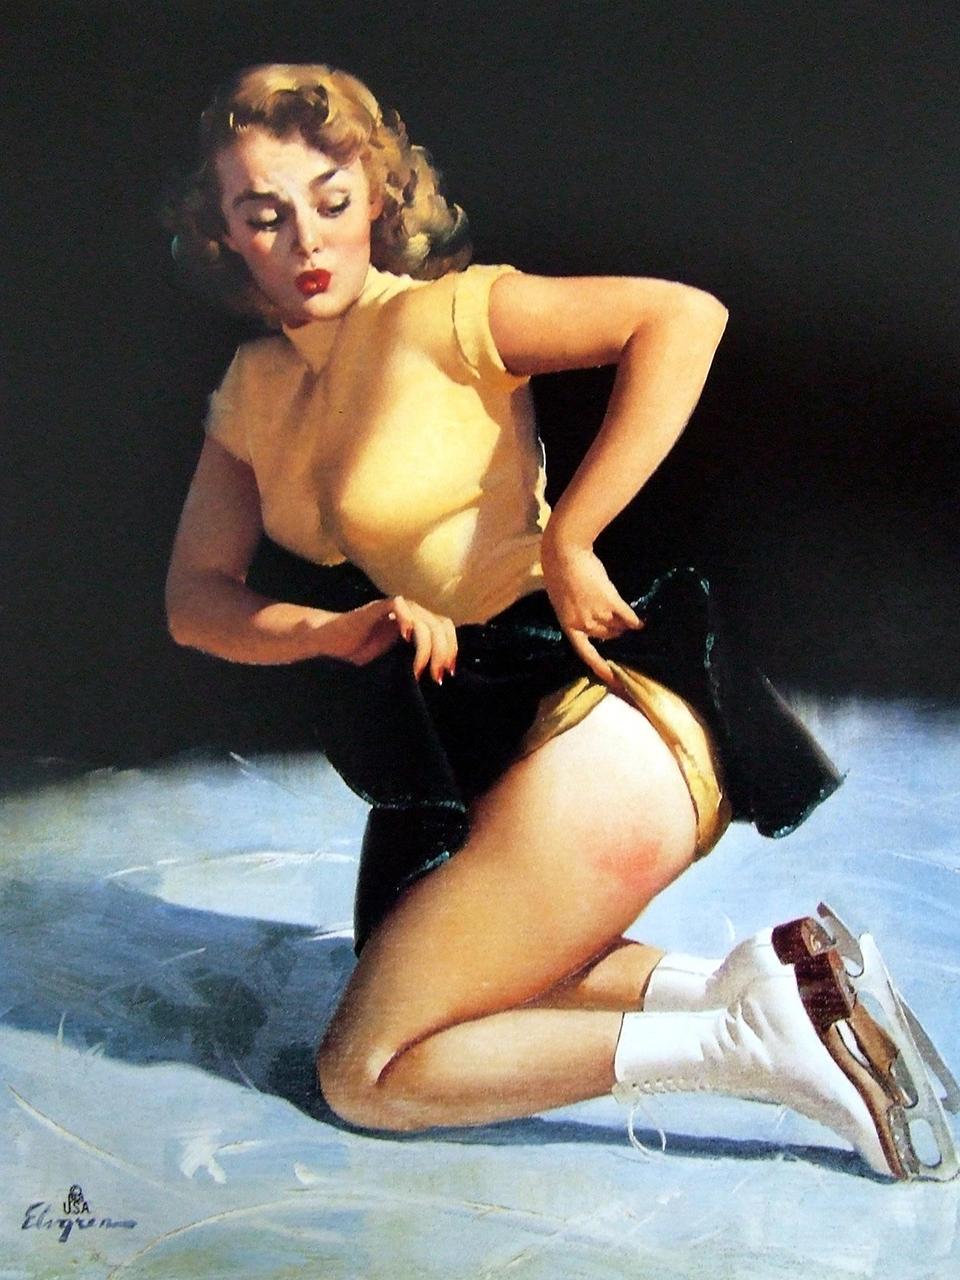 Постер на подрамнике Джил Элвгрен: A cute injury